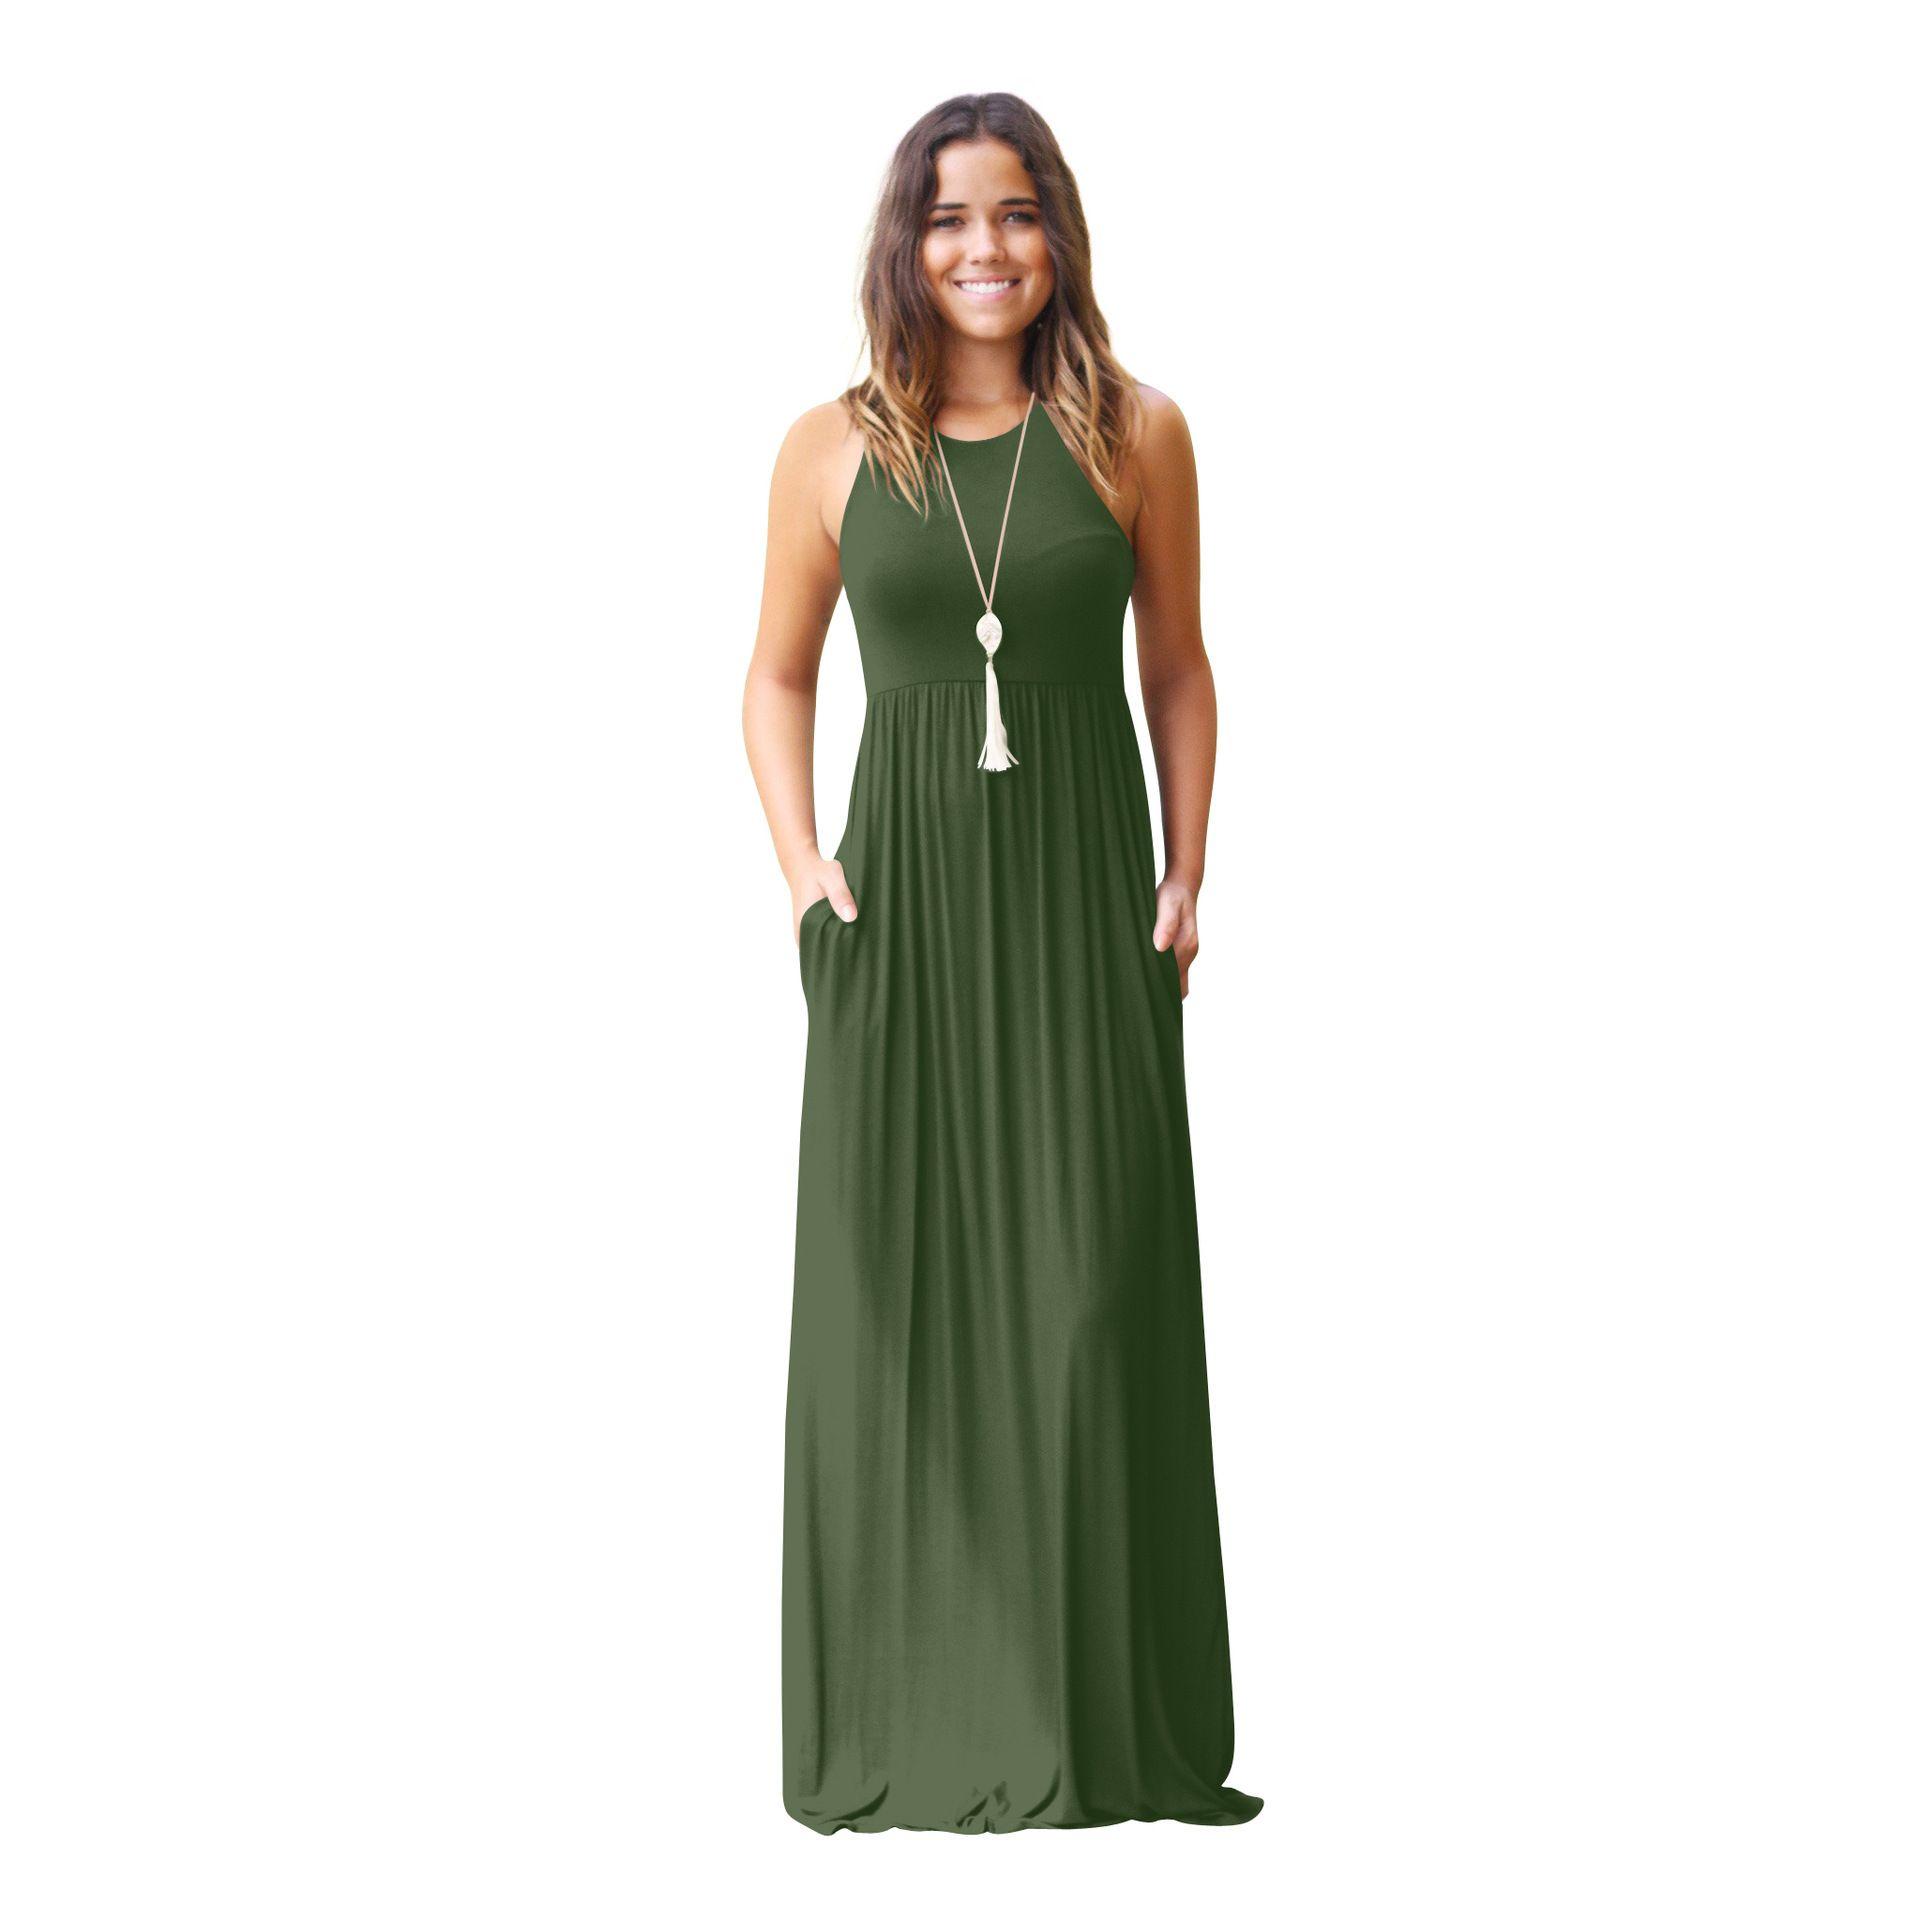 Side New Fashion Women S Casual Plain Sleeveless Vest Dress Strap Pocket Dress Walmart Com Long Dress Casual Short Sleeve Maxi Dresses Maxi Dress [ 1920 x 1920 Pixel ]